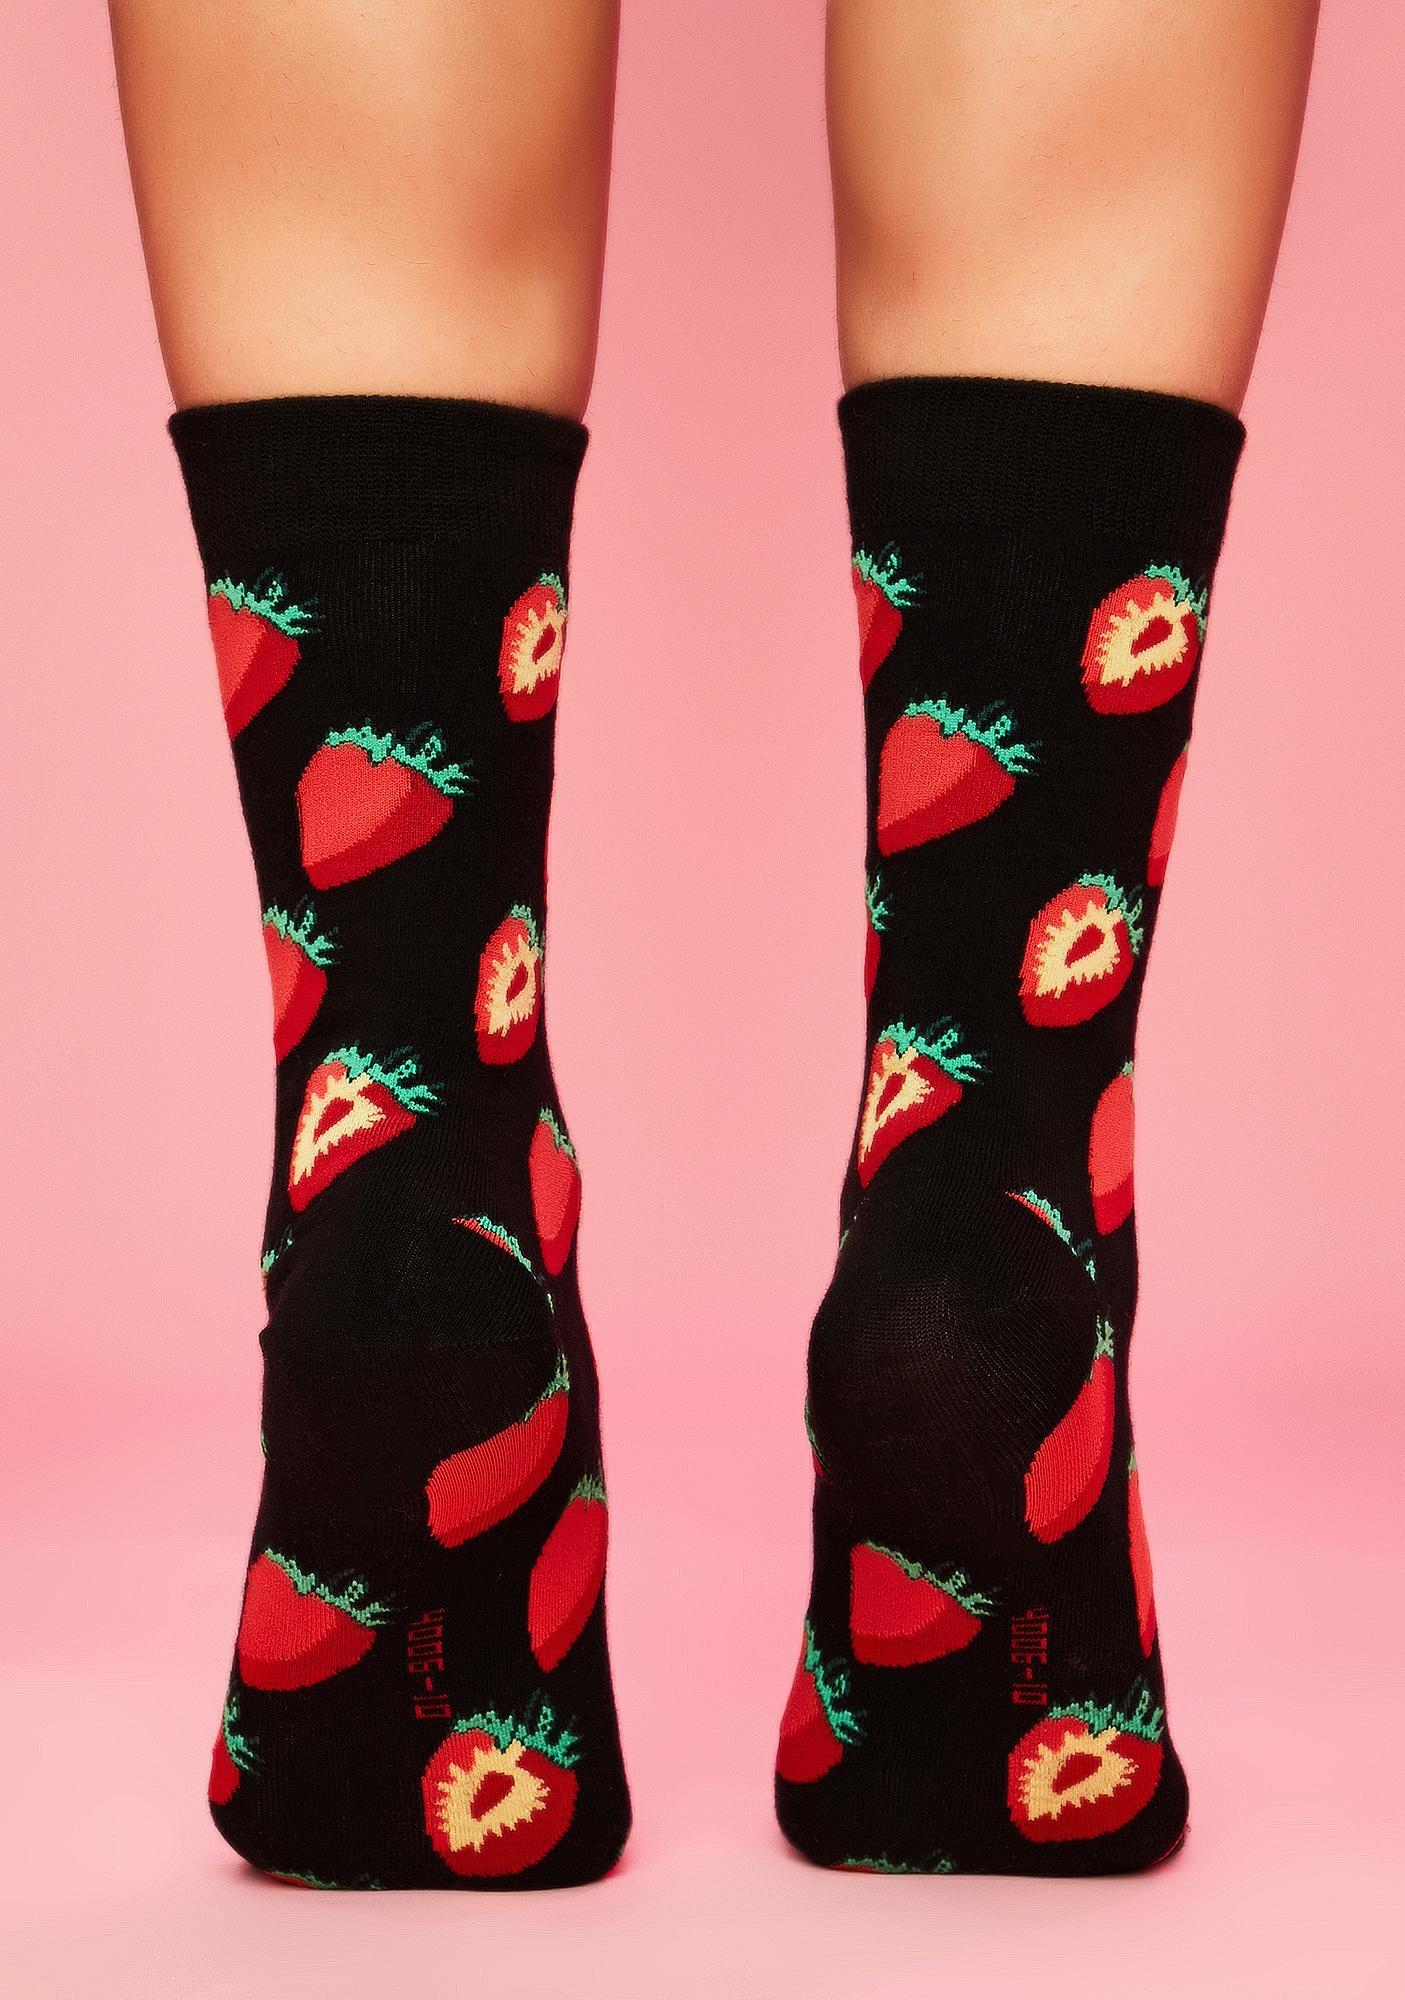 Strawberry Swing Crew Socks